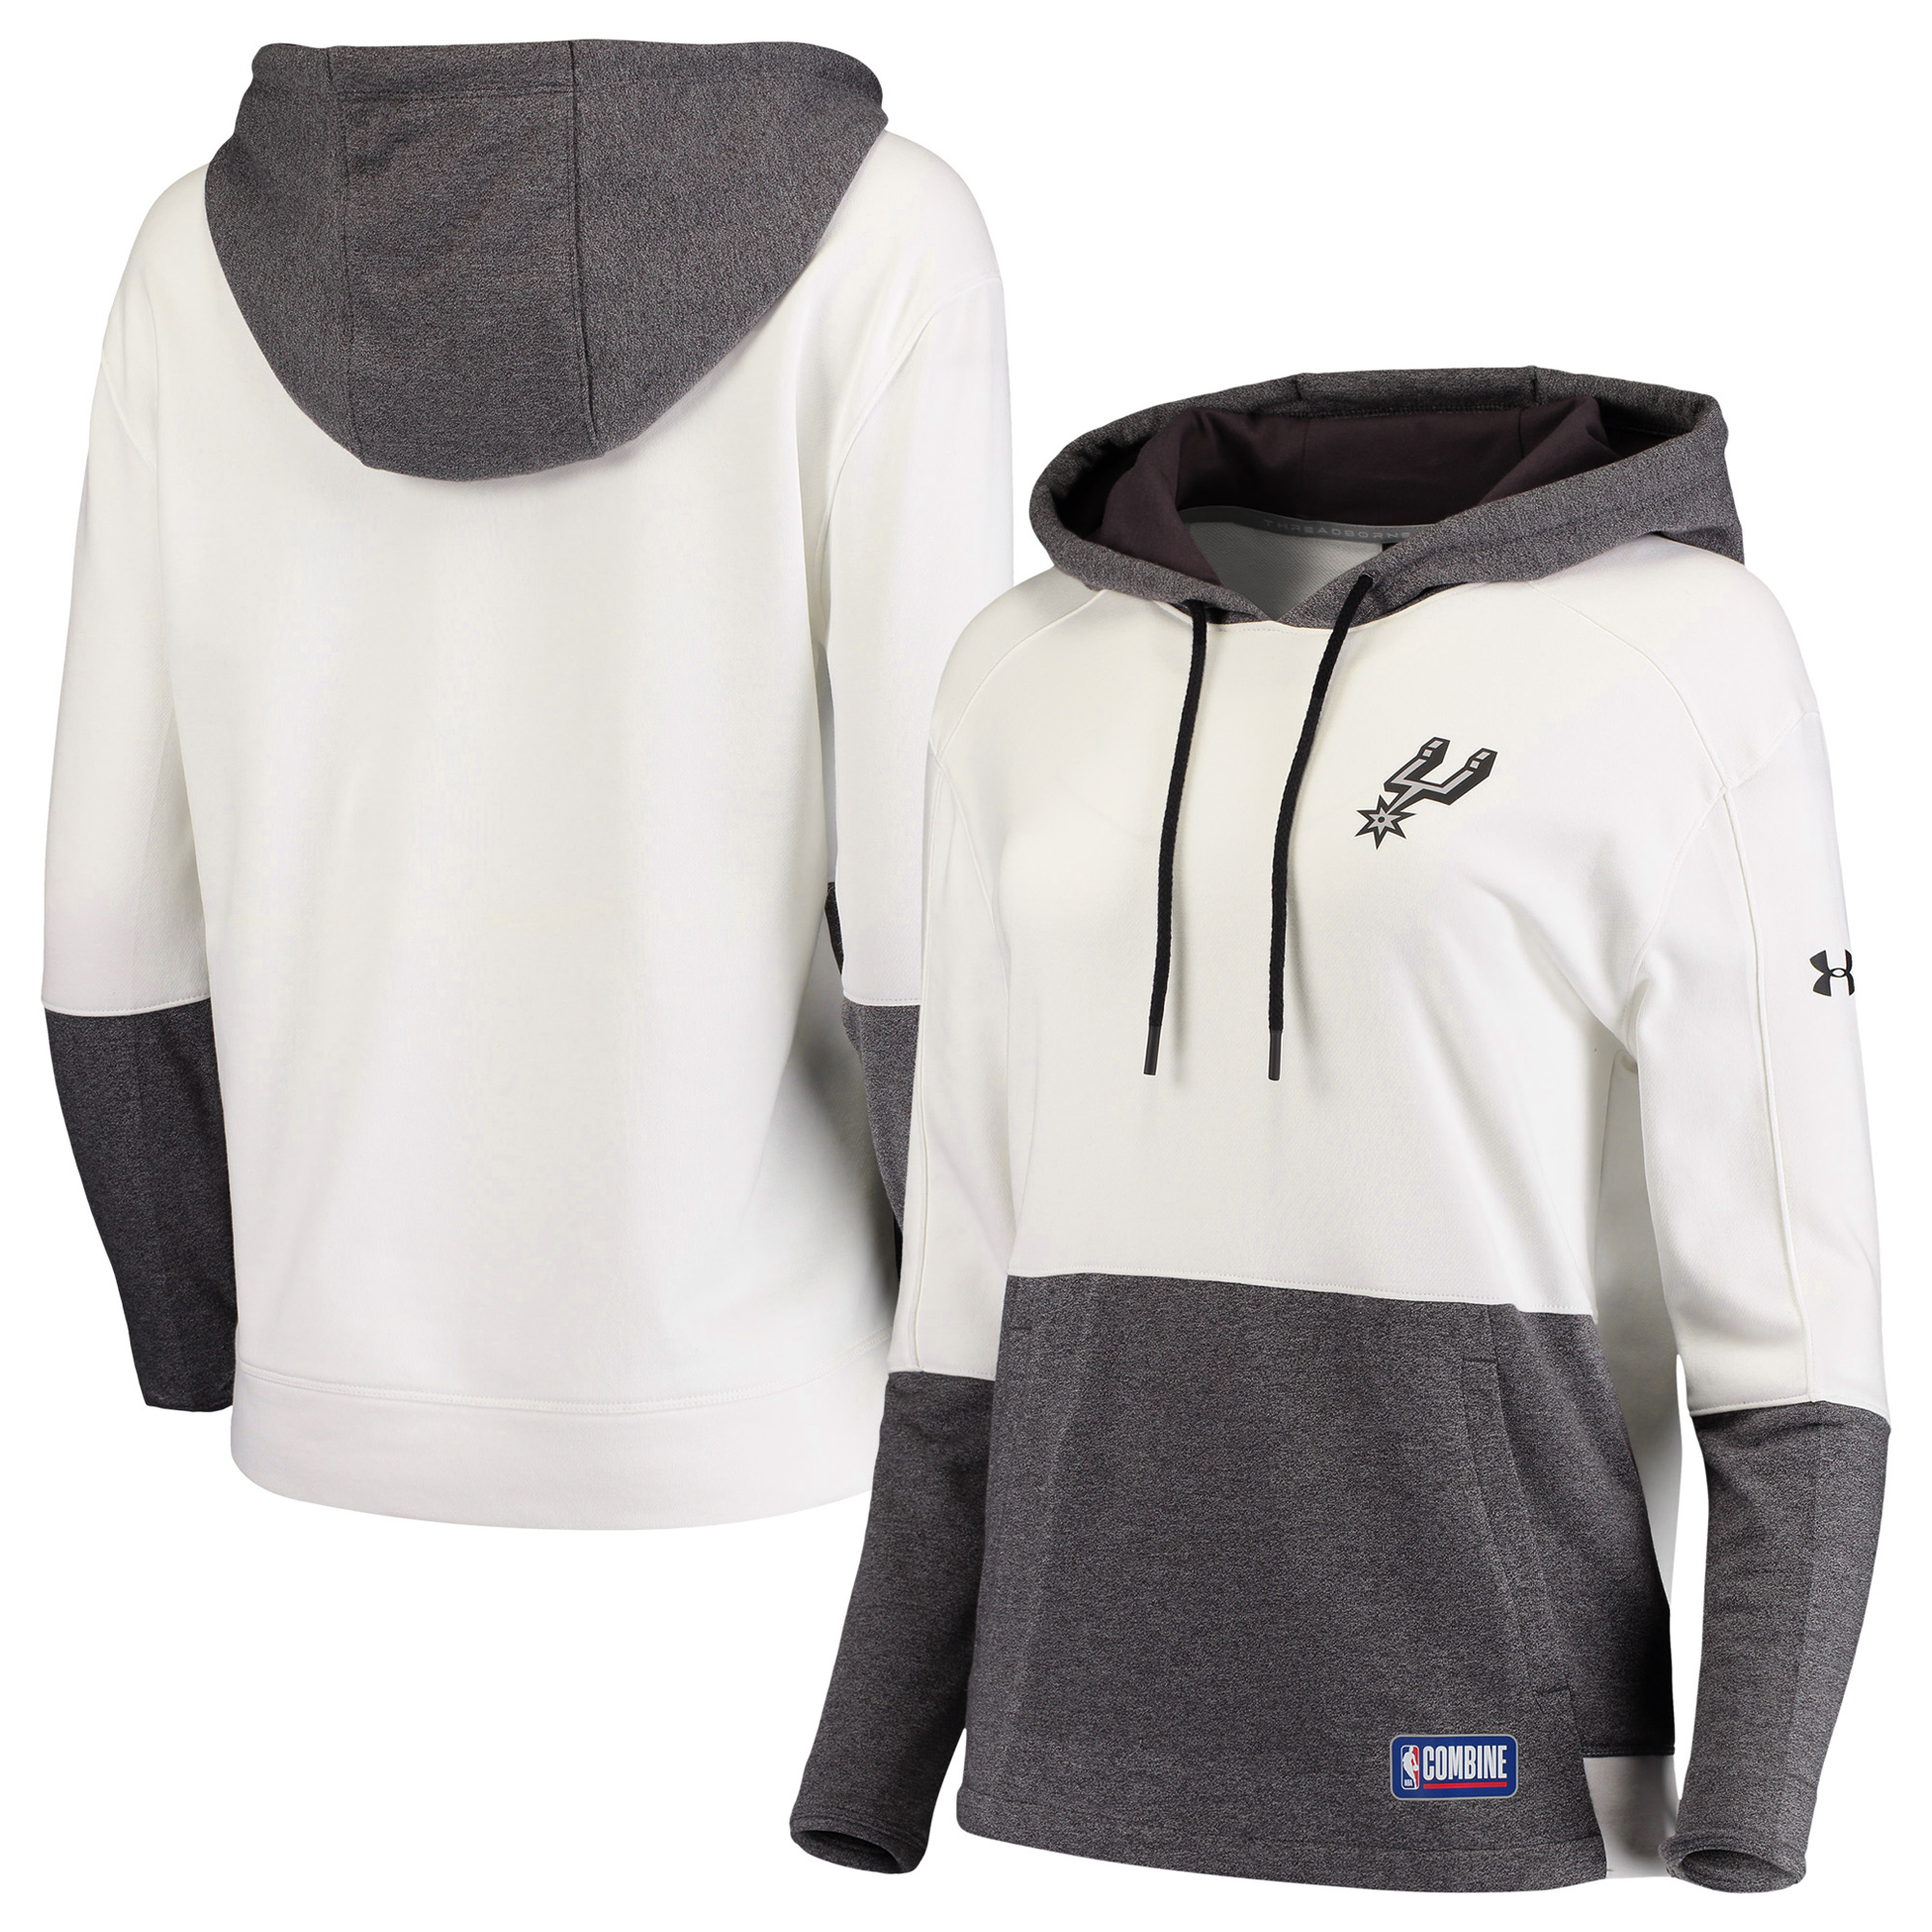 San Antonio Spurs Under Armour Women's Combine Authentic Baseline Layer Threadborne Hoodie - White/Gray